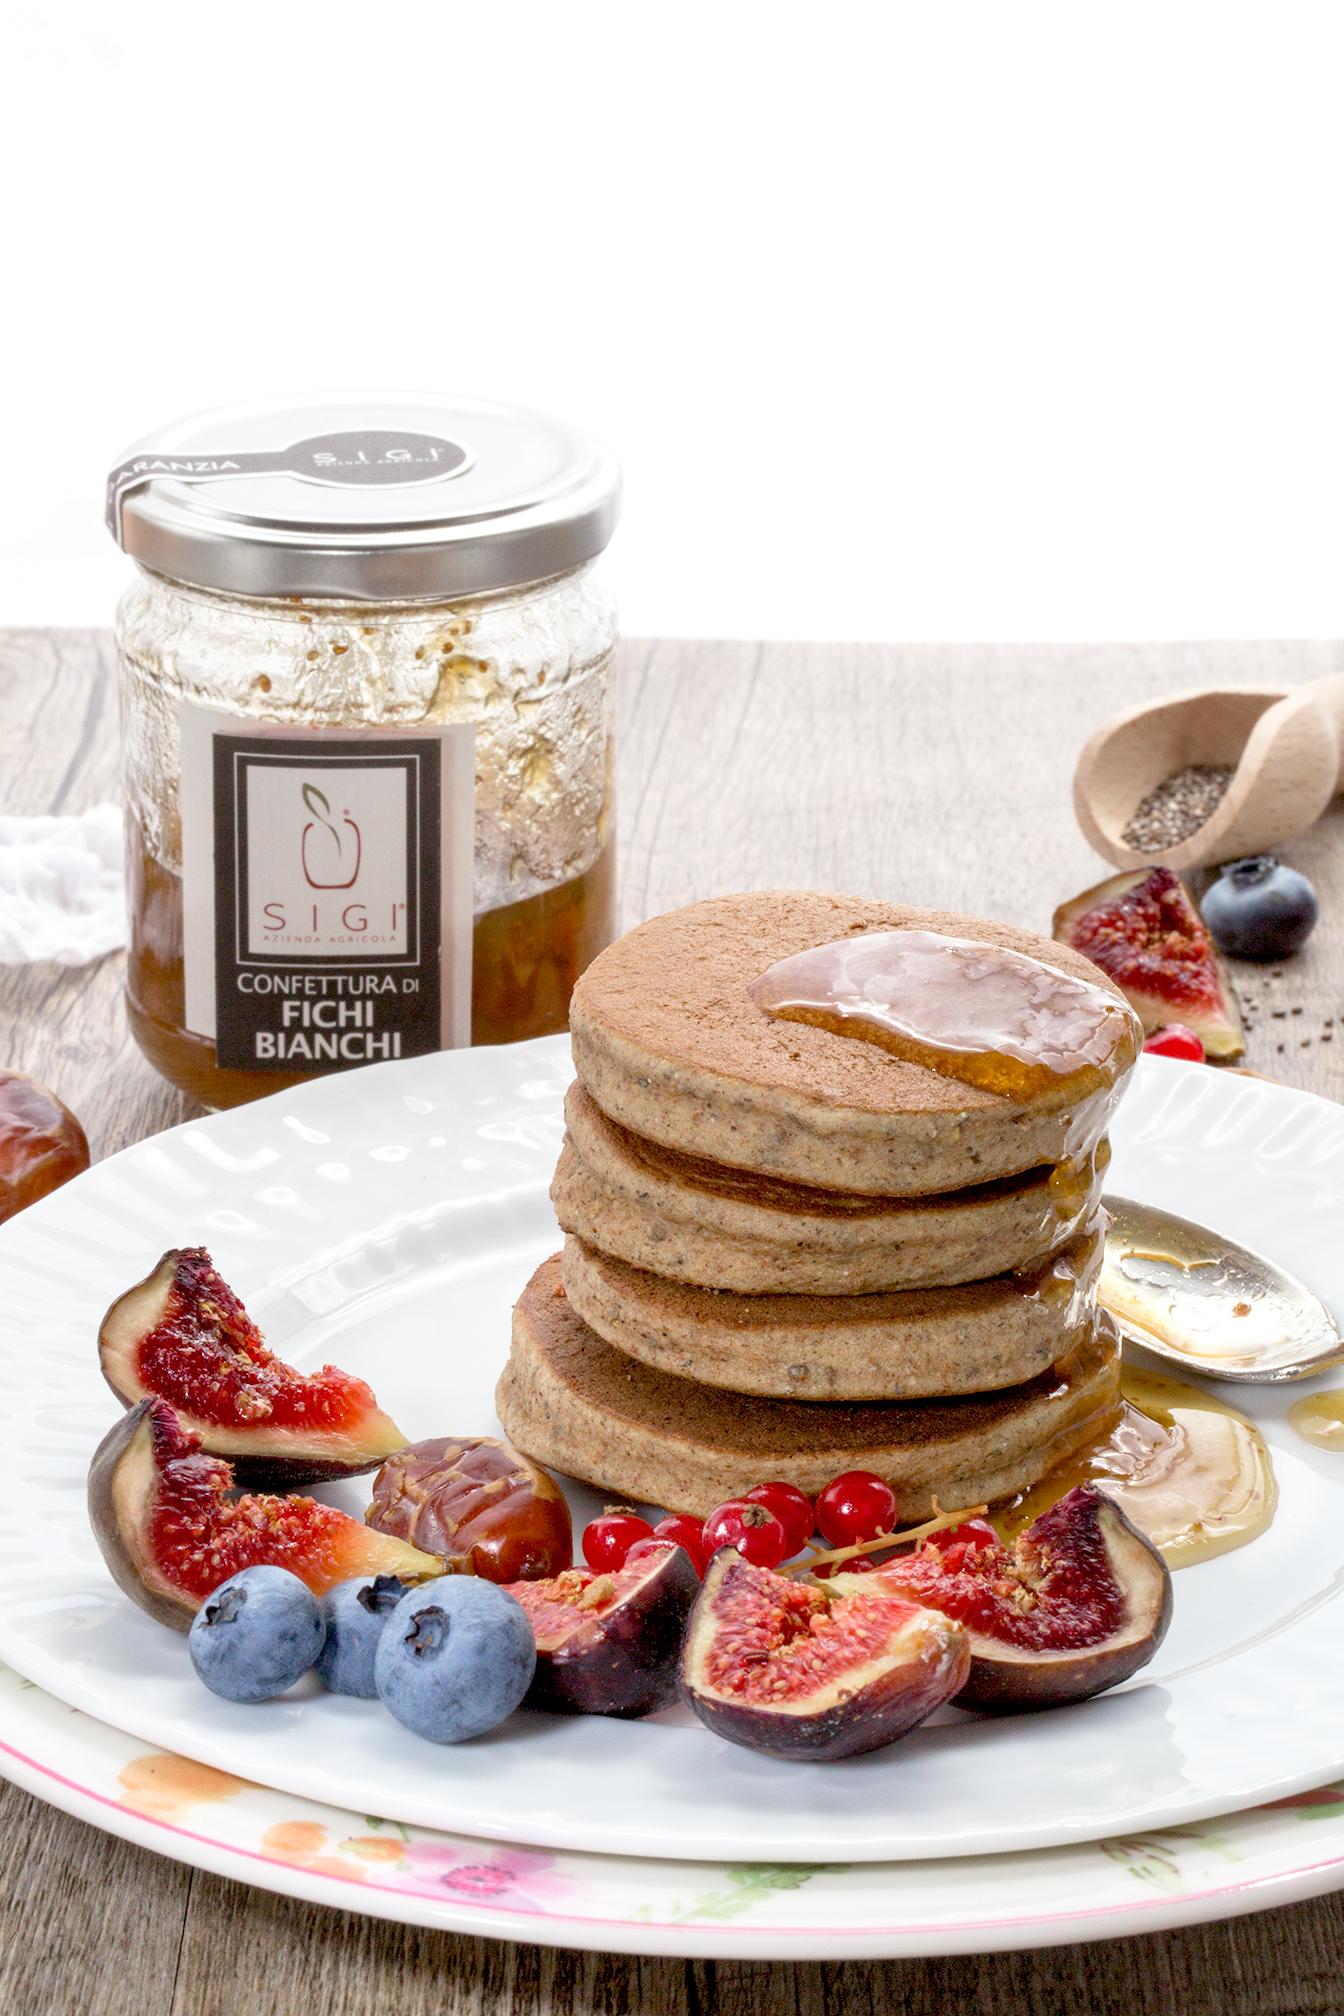 pancakes vegan senza glutine con grano saraceno e datteri | vegan glutenfree buckwheat figs pancakes